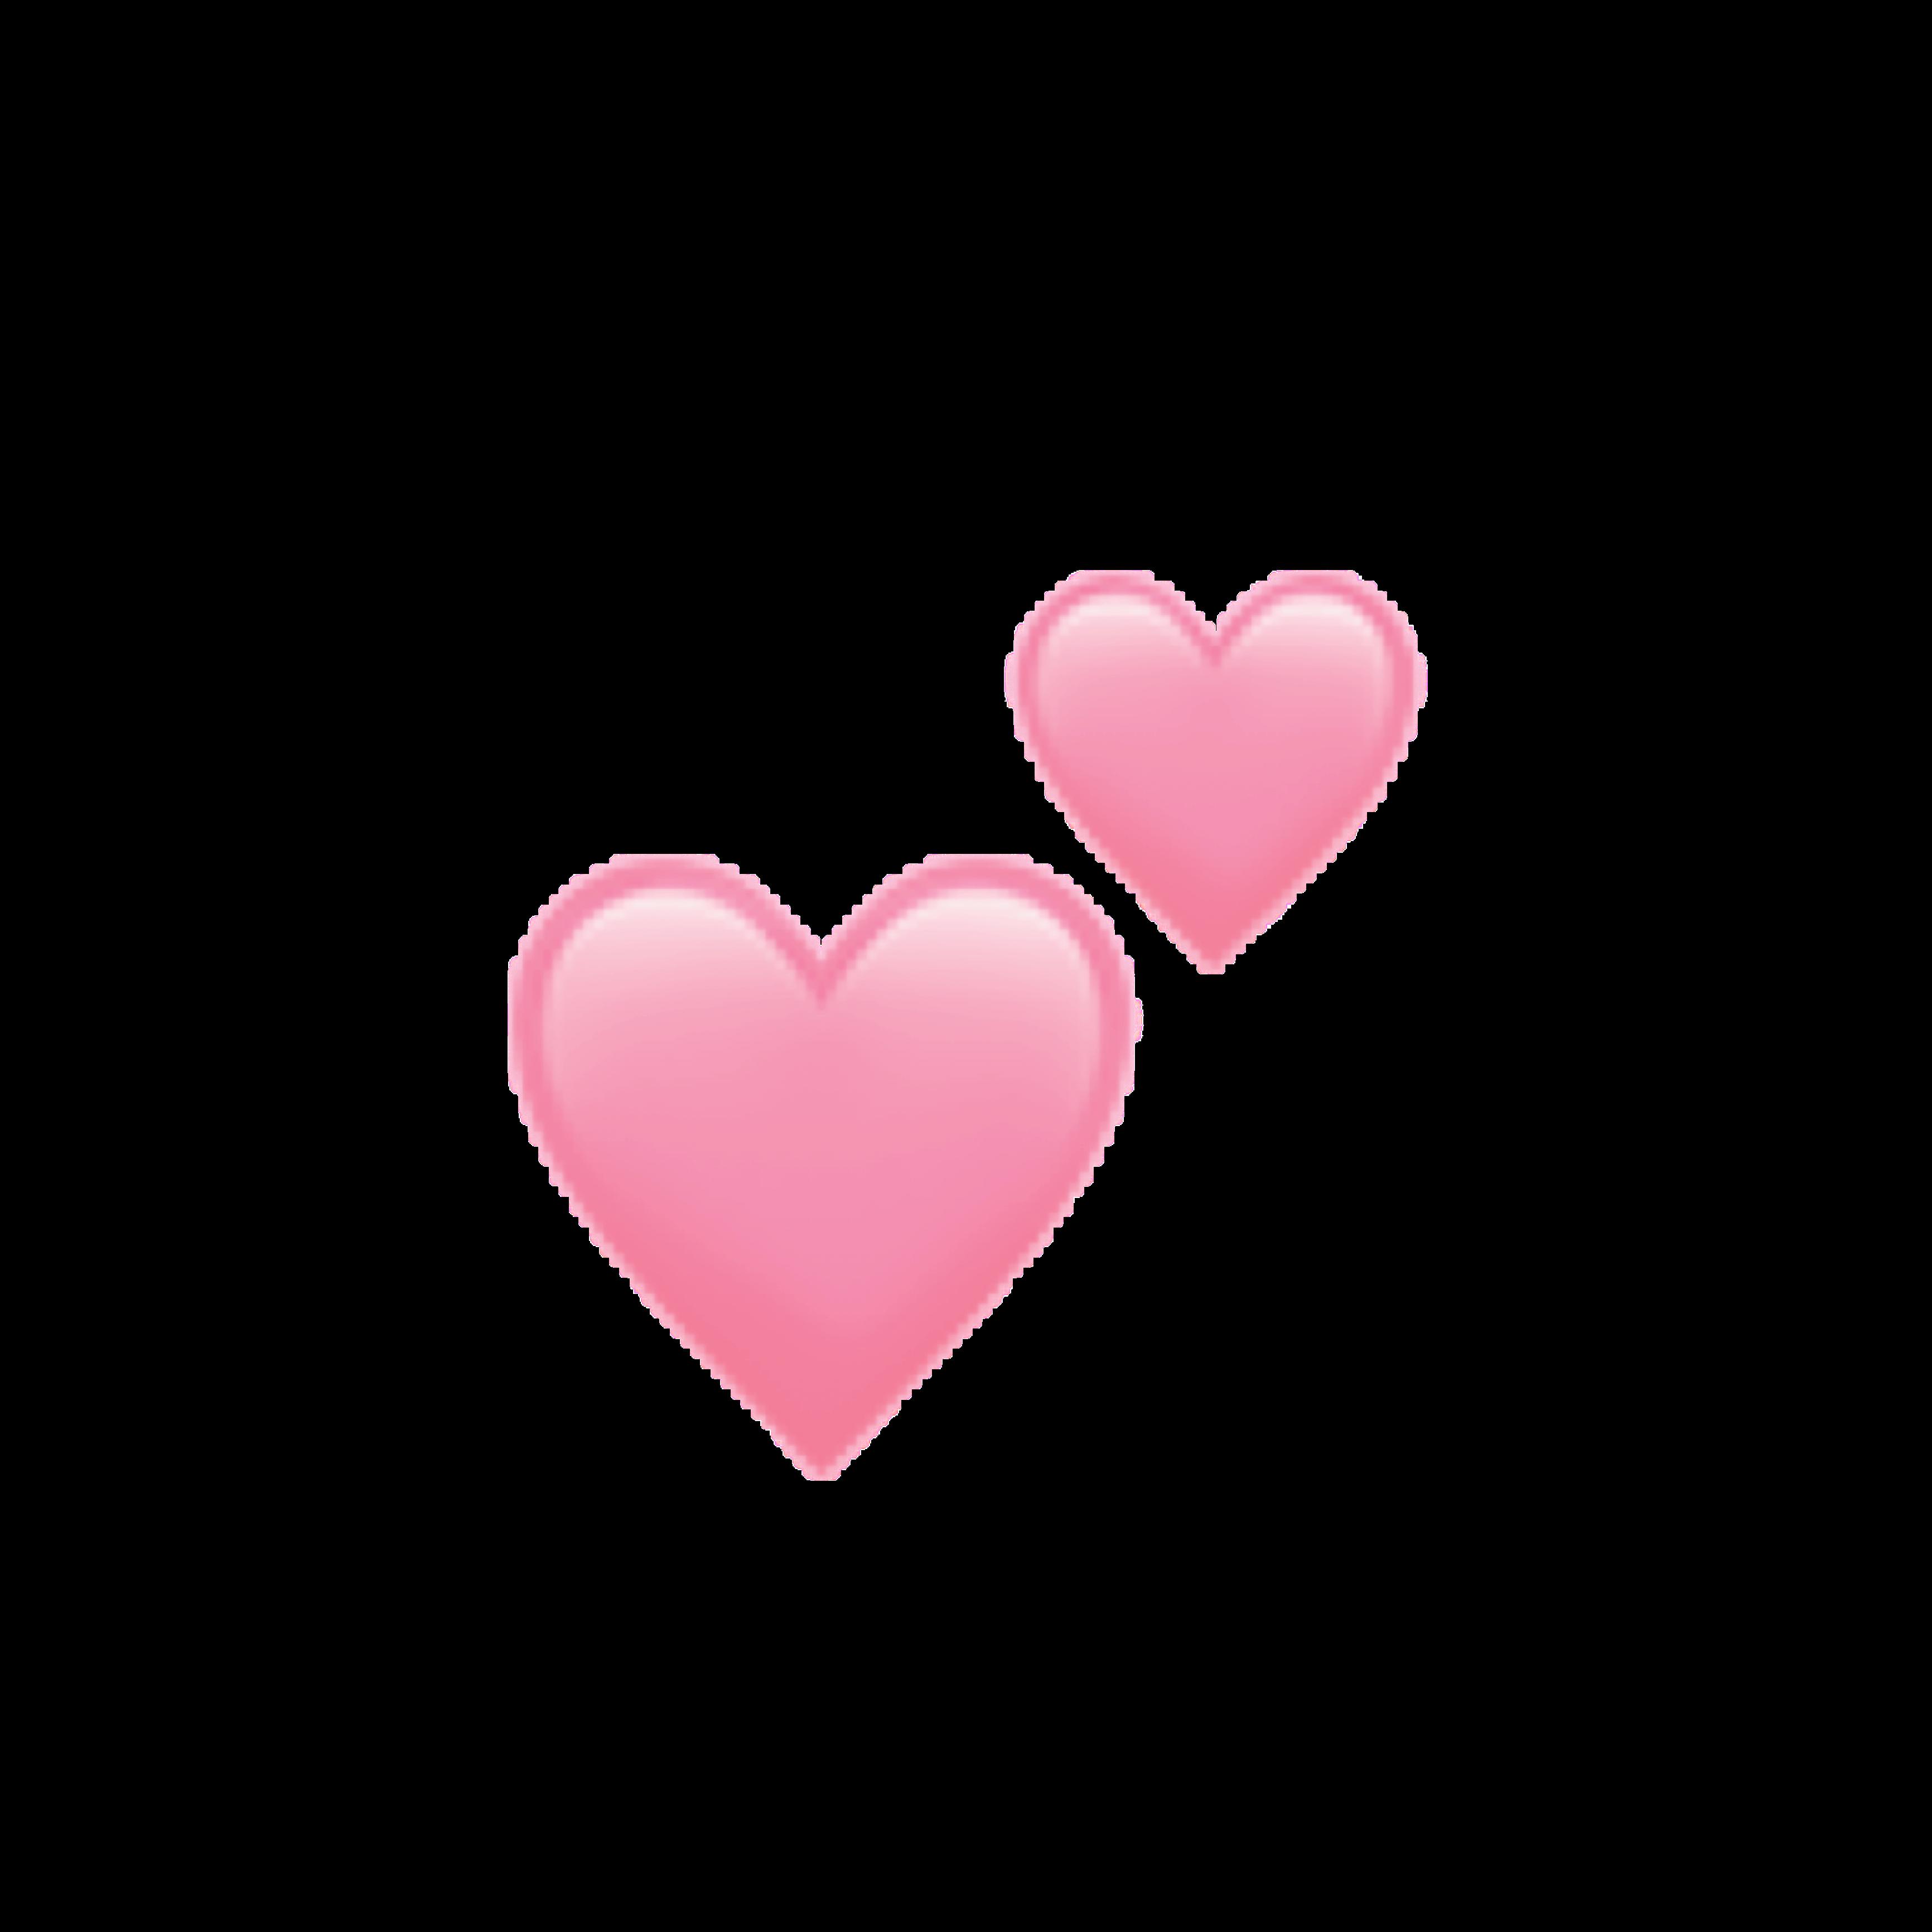 Aesthetic Pink Heart Emoji Transparent - Largest Wallpaper ... - Pastel Heart Emoji